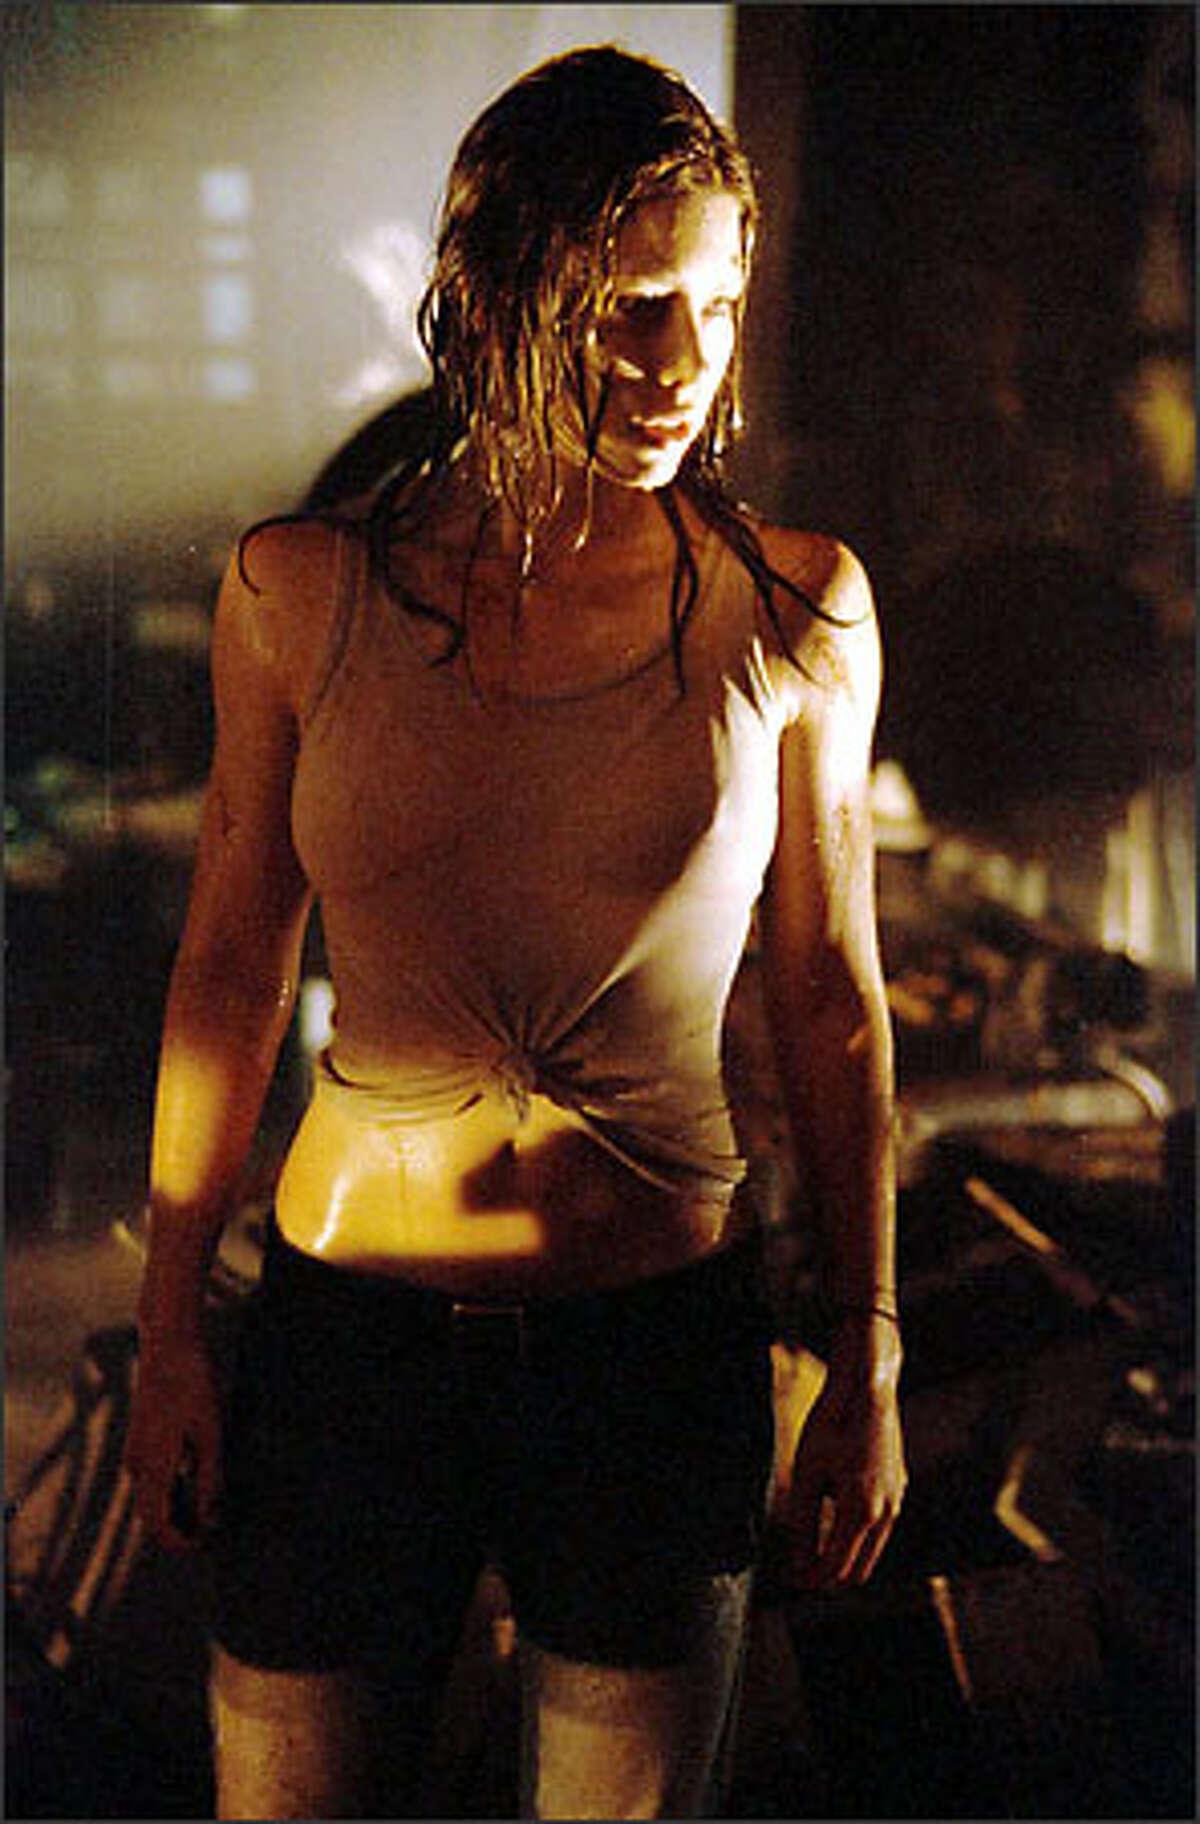 Jessica Biel plays Erin.